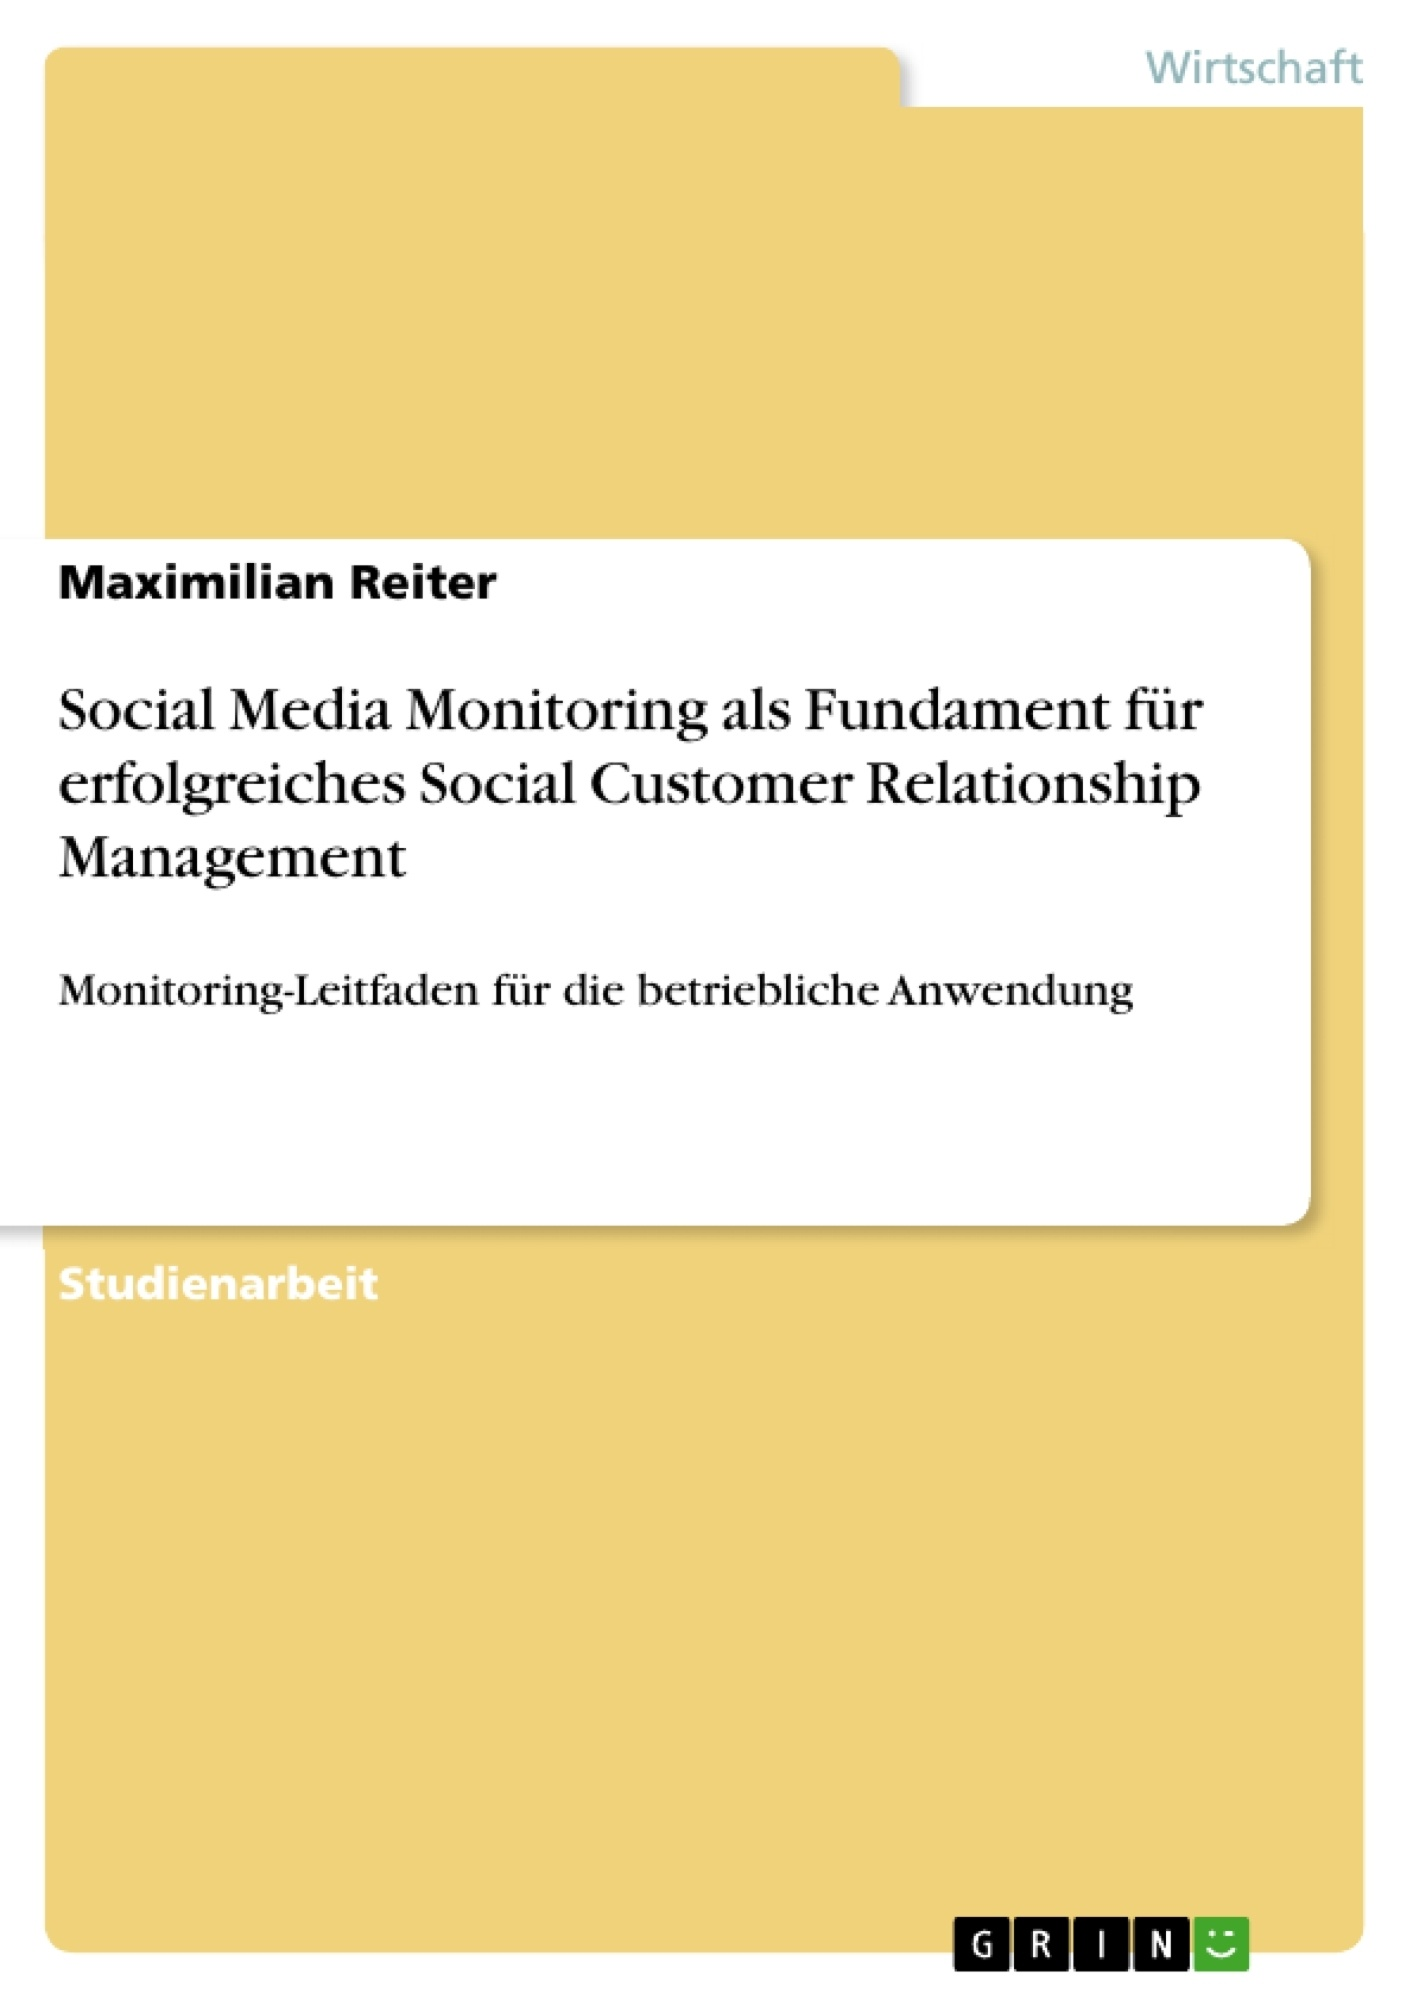 Titel: Social Media Monitoring als Fundament für erfolgreiches Social Customer Relationship Management